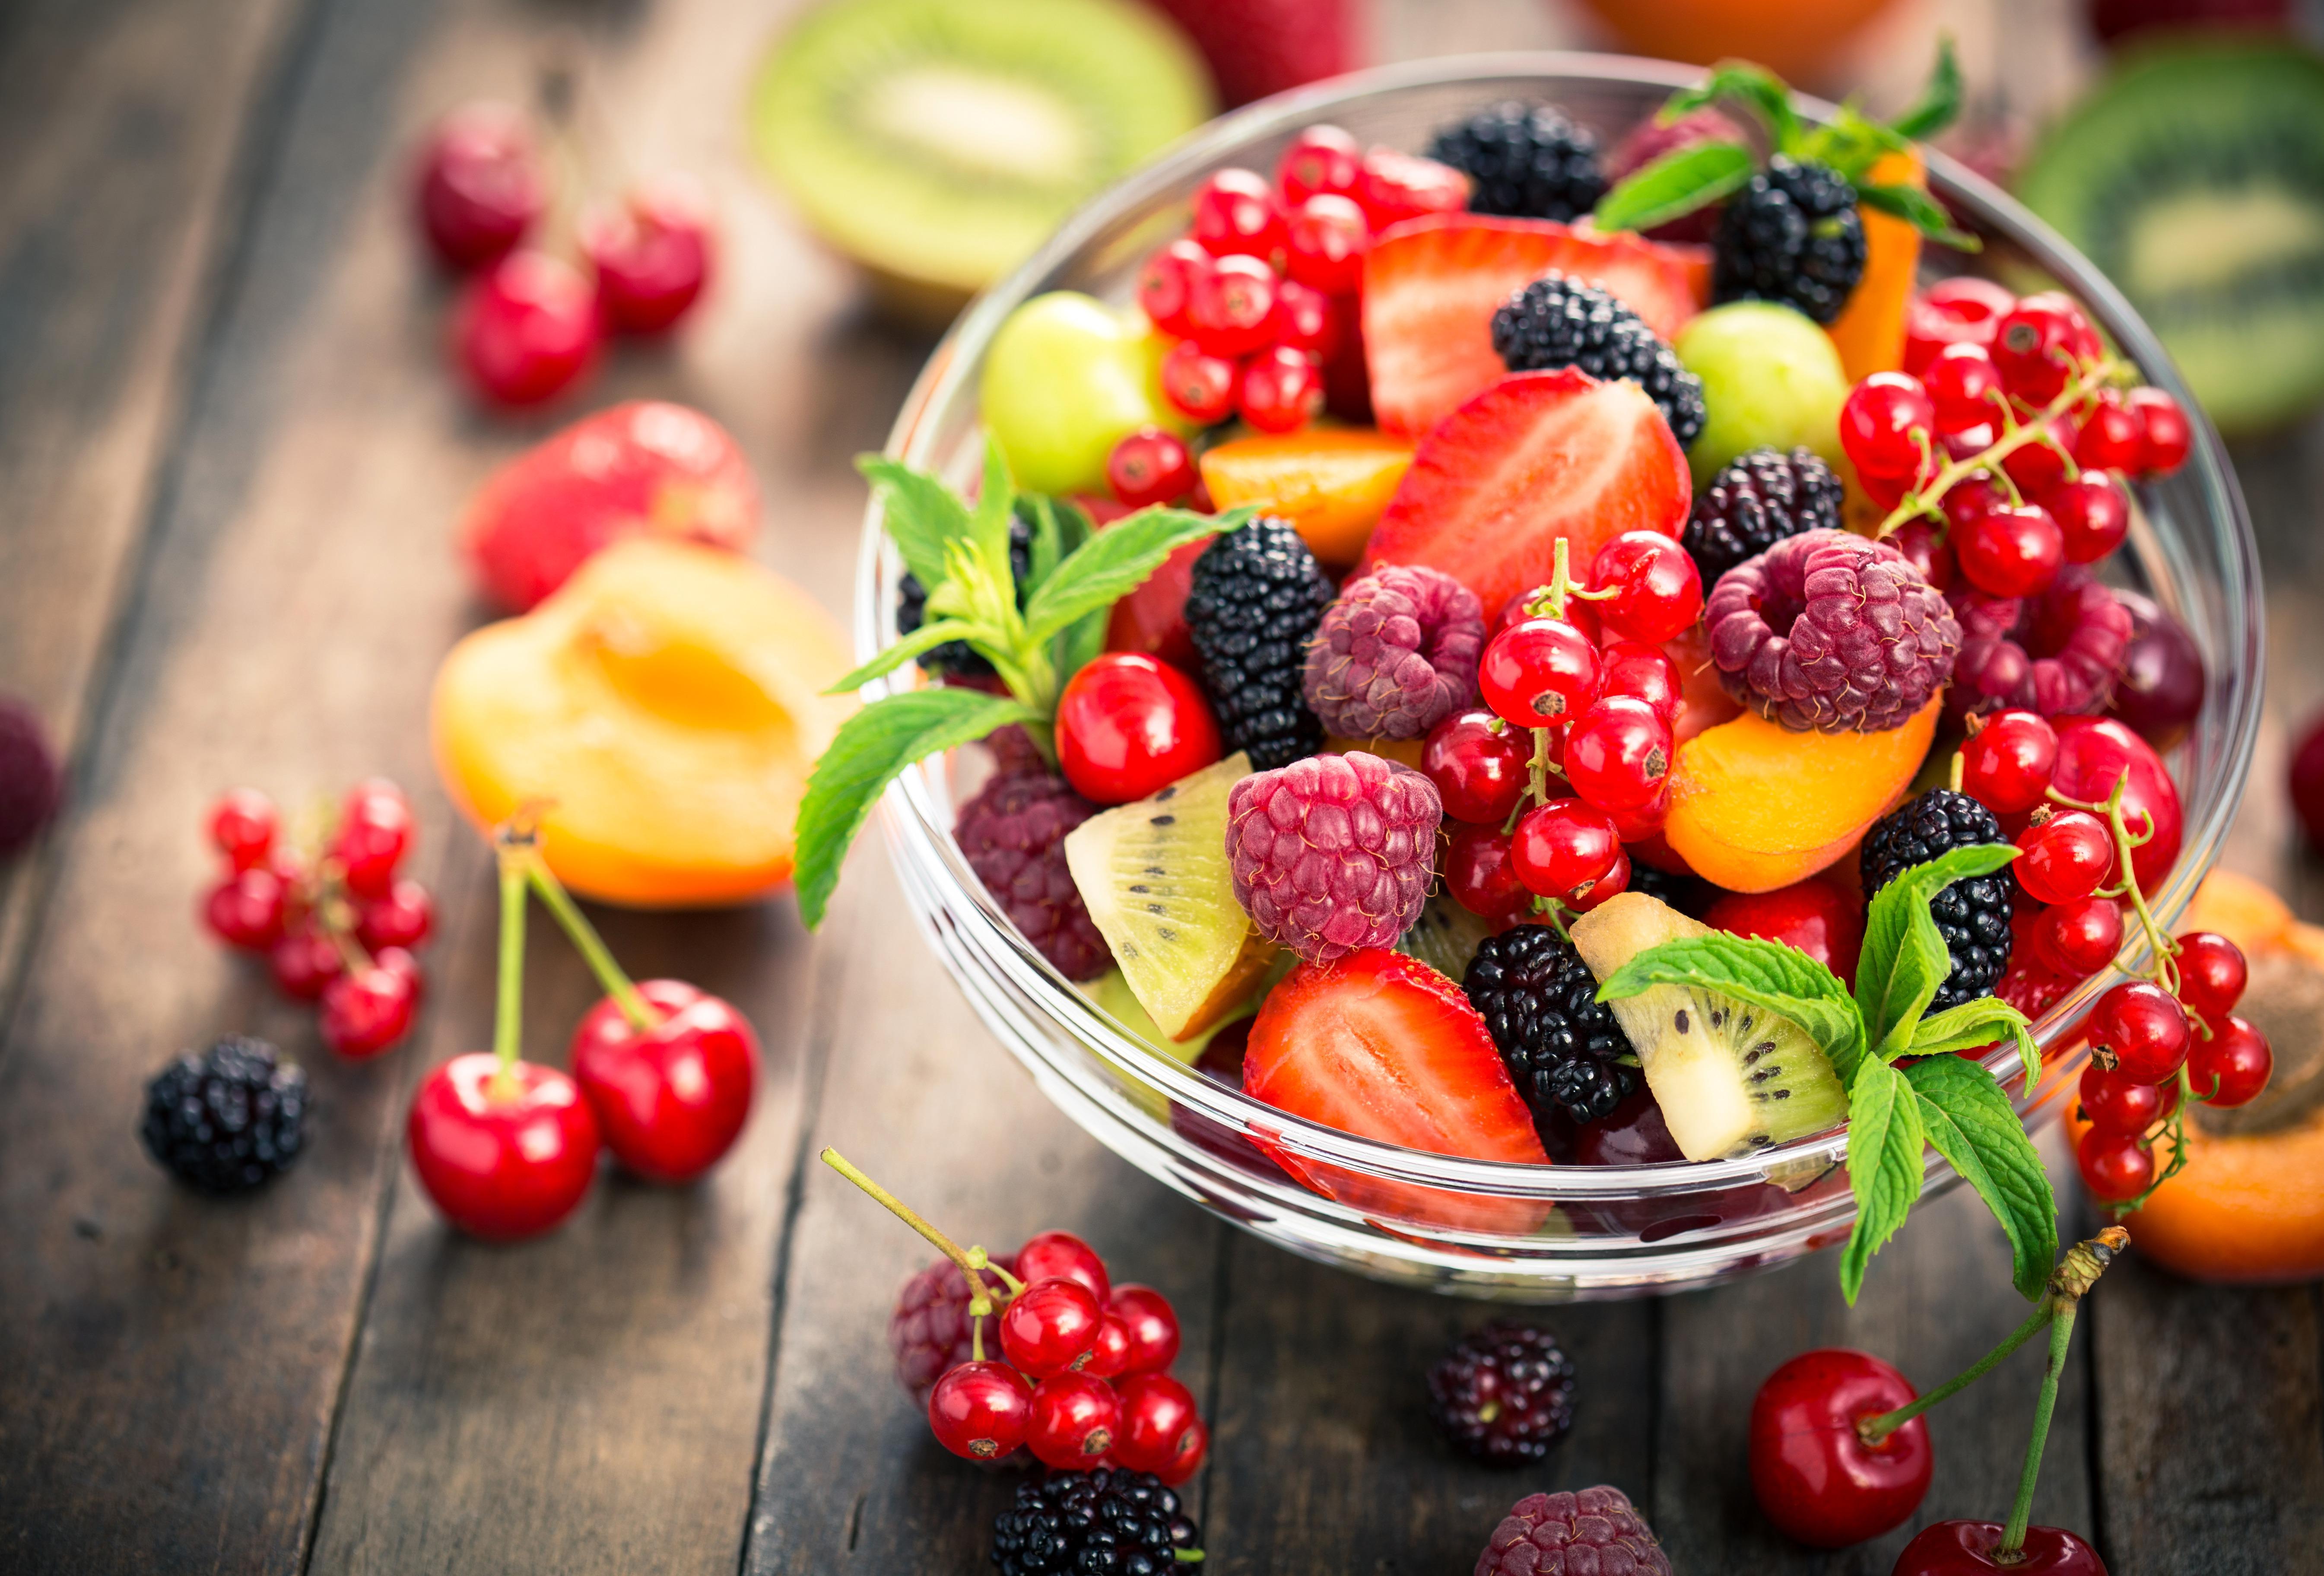 Еда и настроение картинки